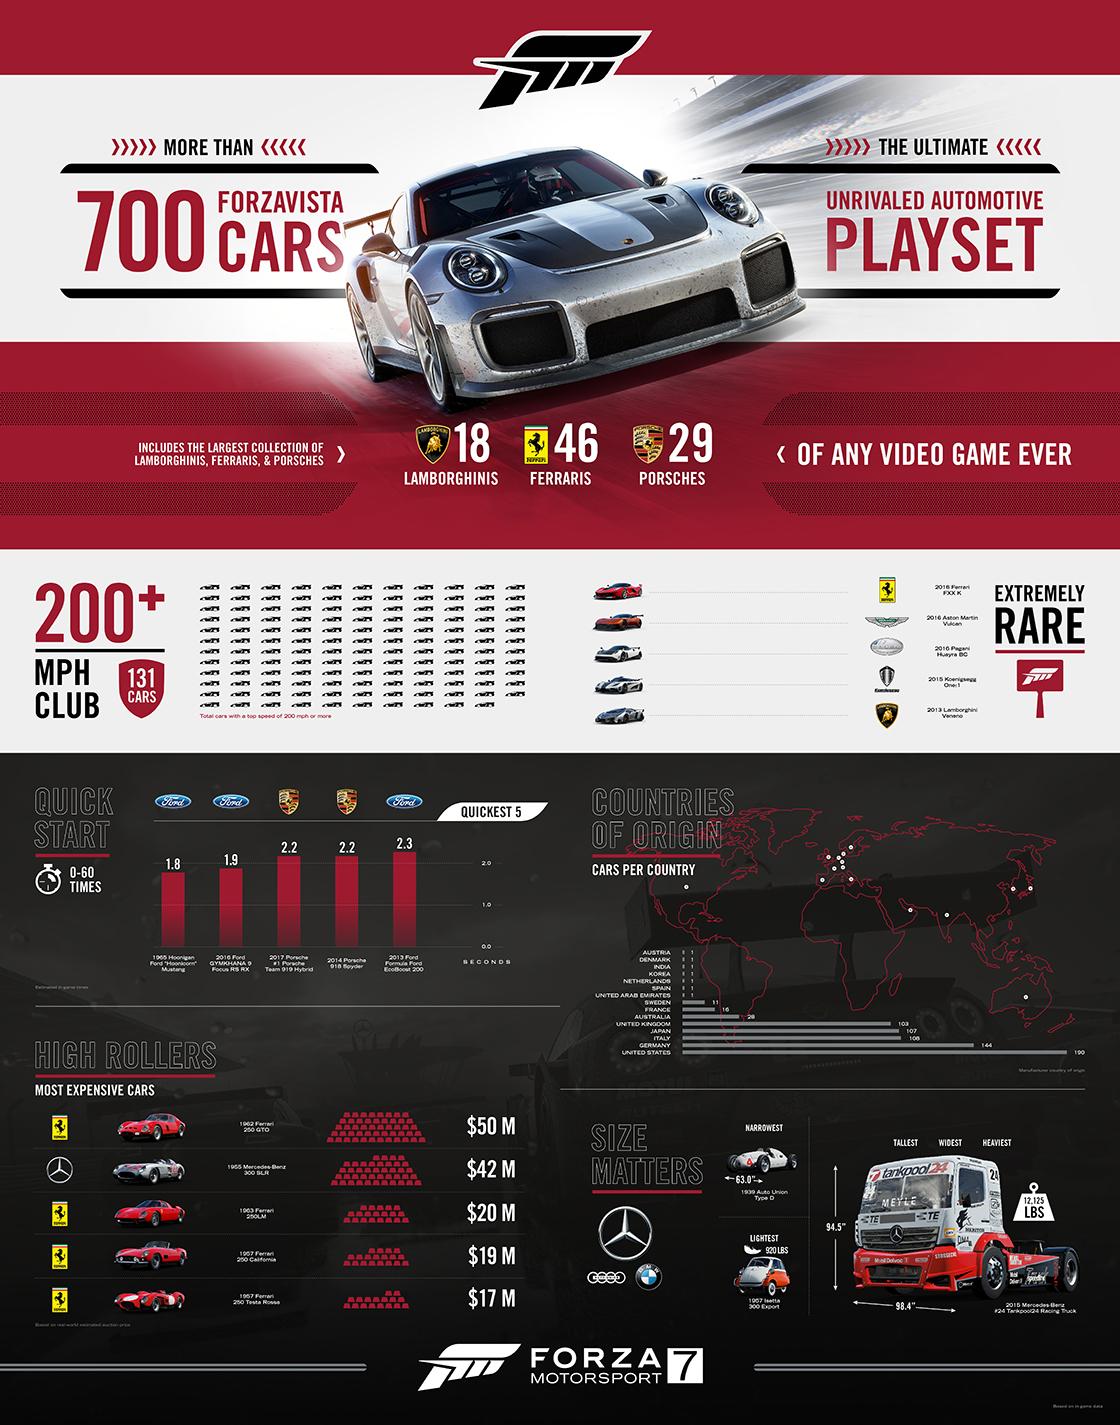 Fahrzeuge Infografik - Forza Motorsport 7